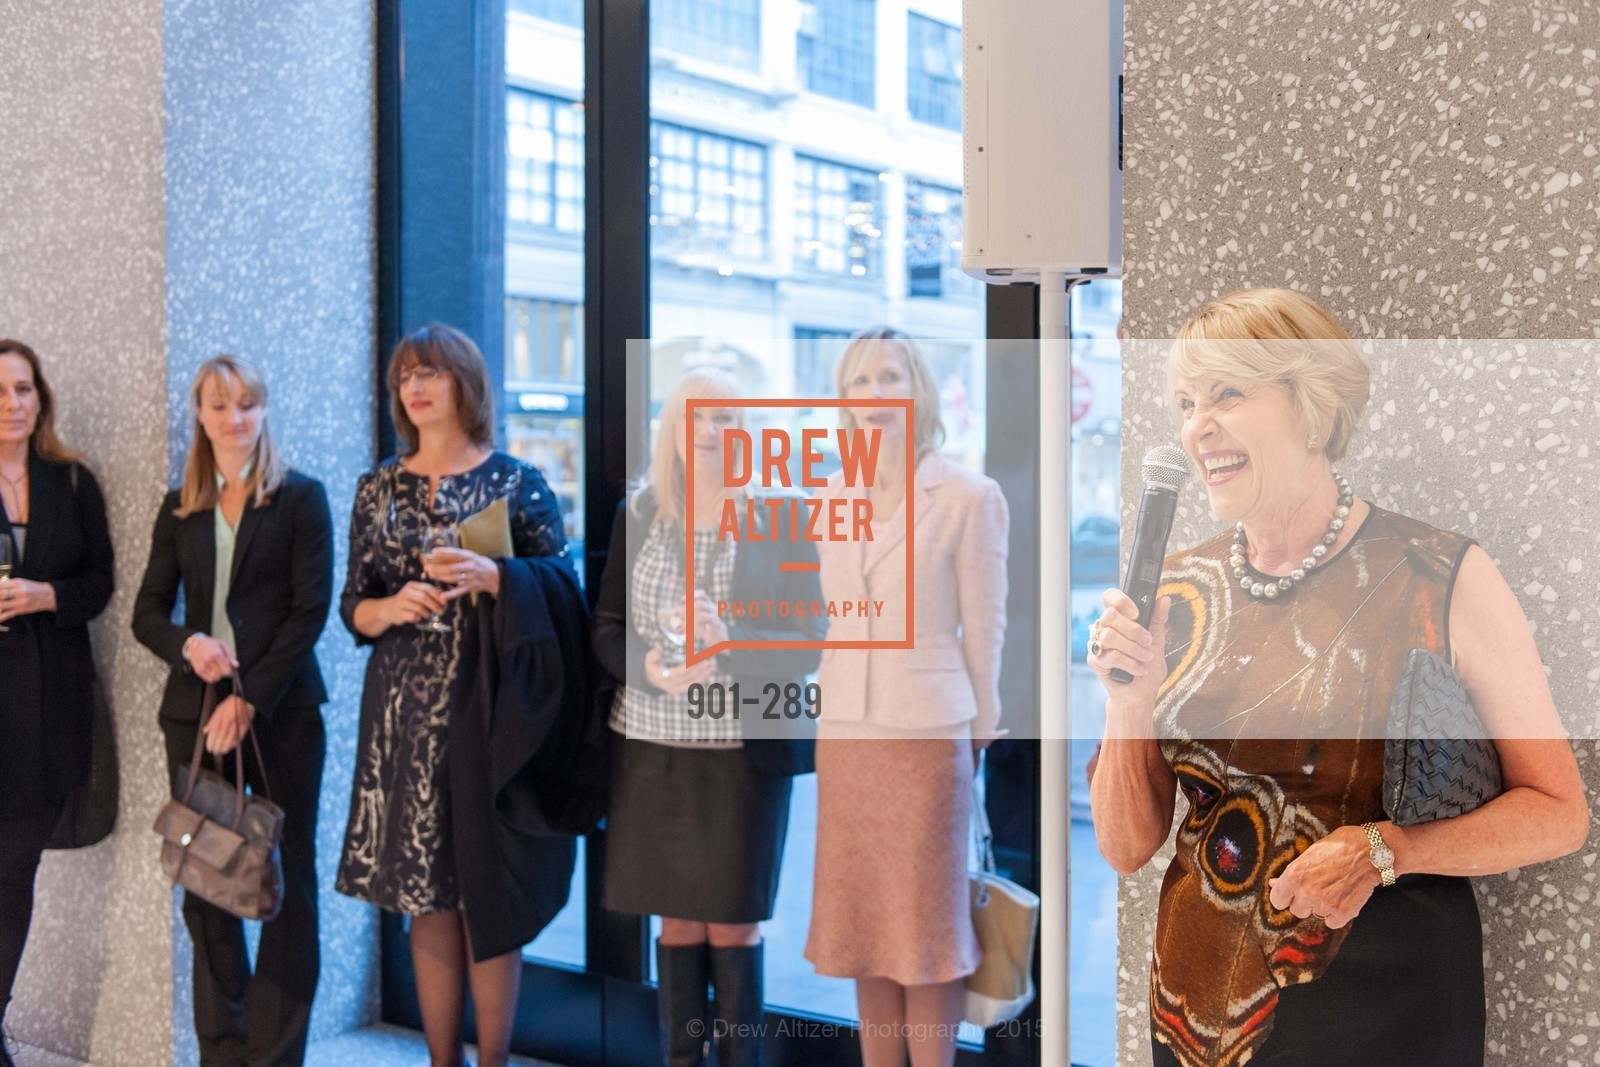 Dagmar Dolby, Valentino Hosts San Francisco Symphony Gala Kickoff Party, Valentino, September 15th, 2015,Drew Altizer, Drew Altizer Photography, full-service agency, private events, San Francisco photographer, photographer california